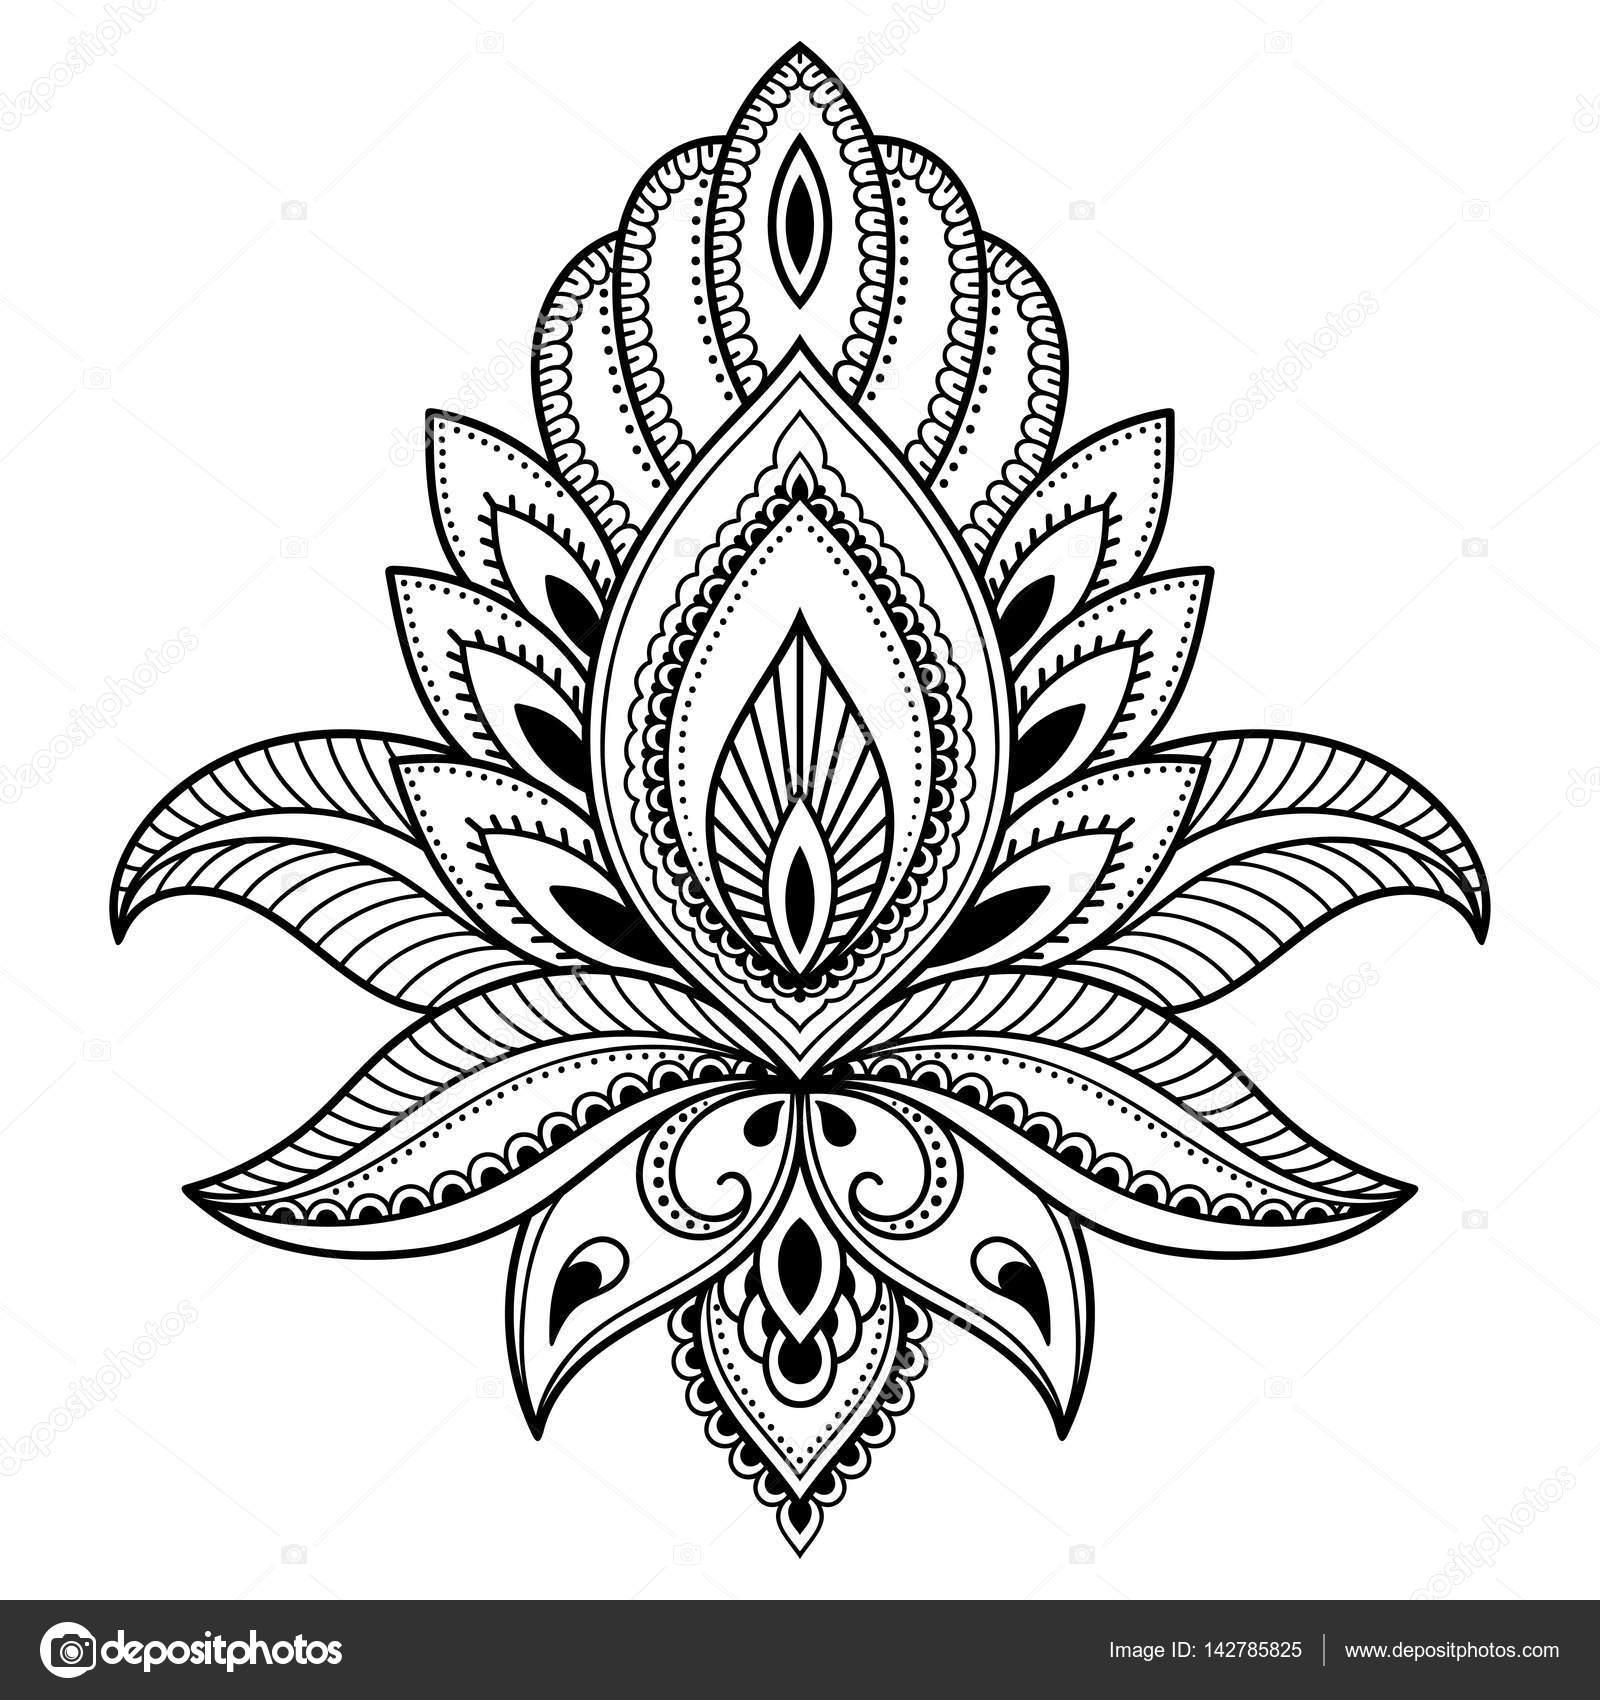 Henna tattoo flower template in indian style ethnic floral paisley henna tattoo flower template in indian style ethnic floral paisley lotus mehndi style izmirmasajfo